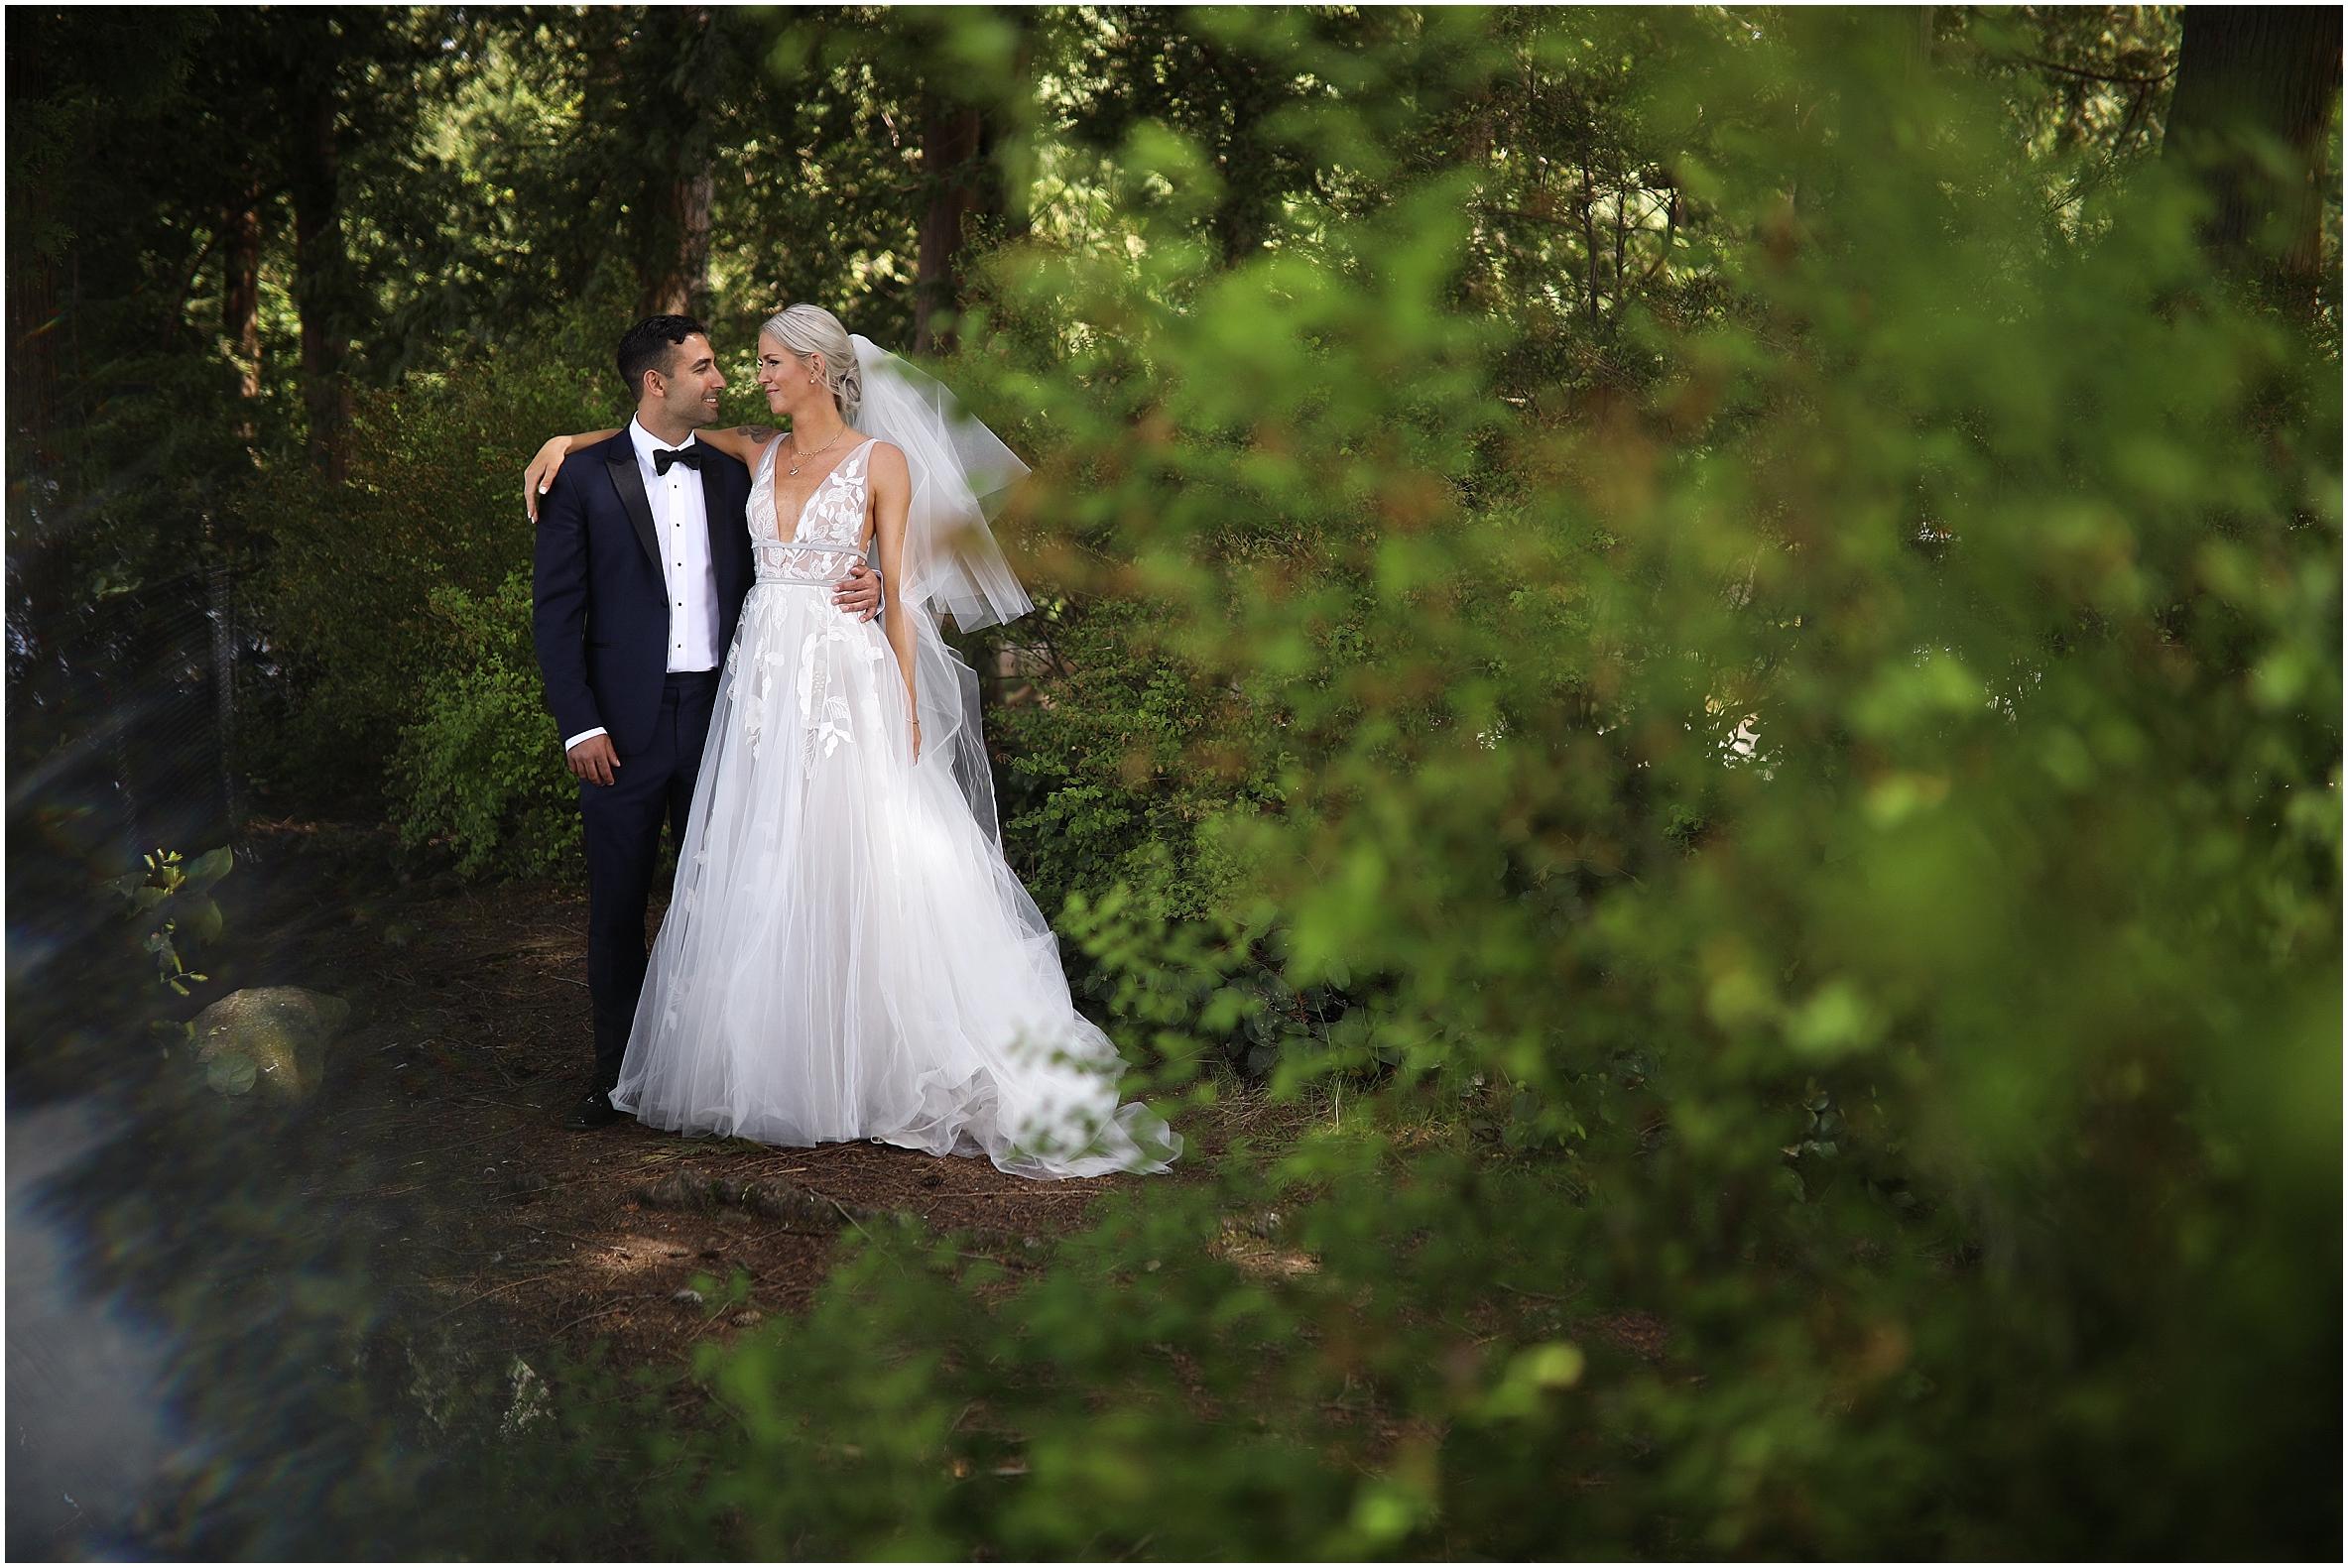 vancouver-wedding-photographer-the-loft-earls-yaletown_0010.jpg